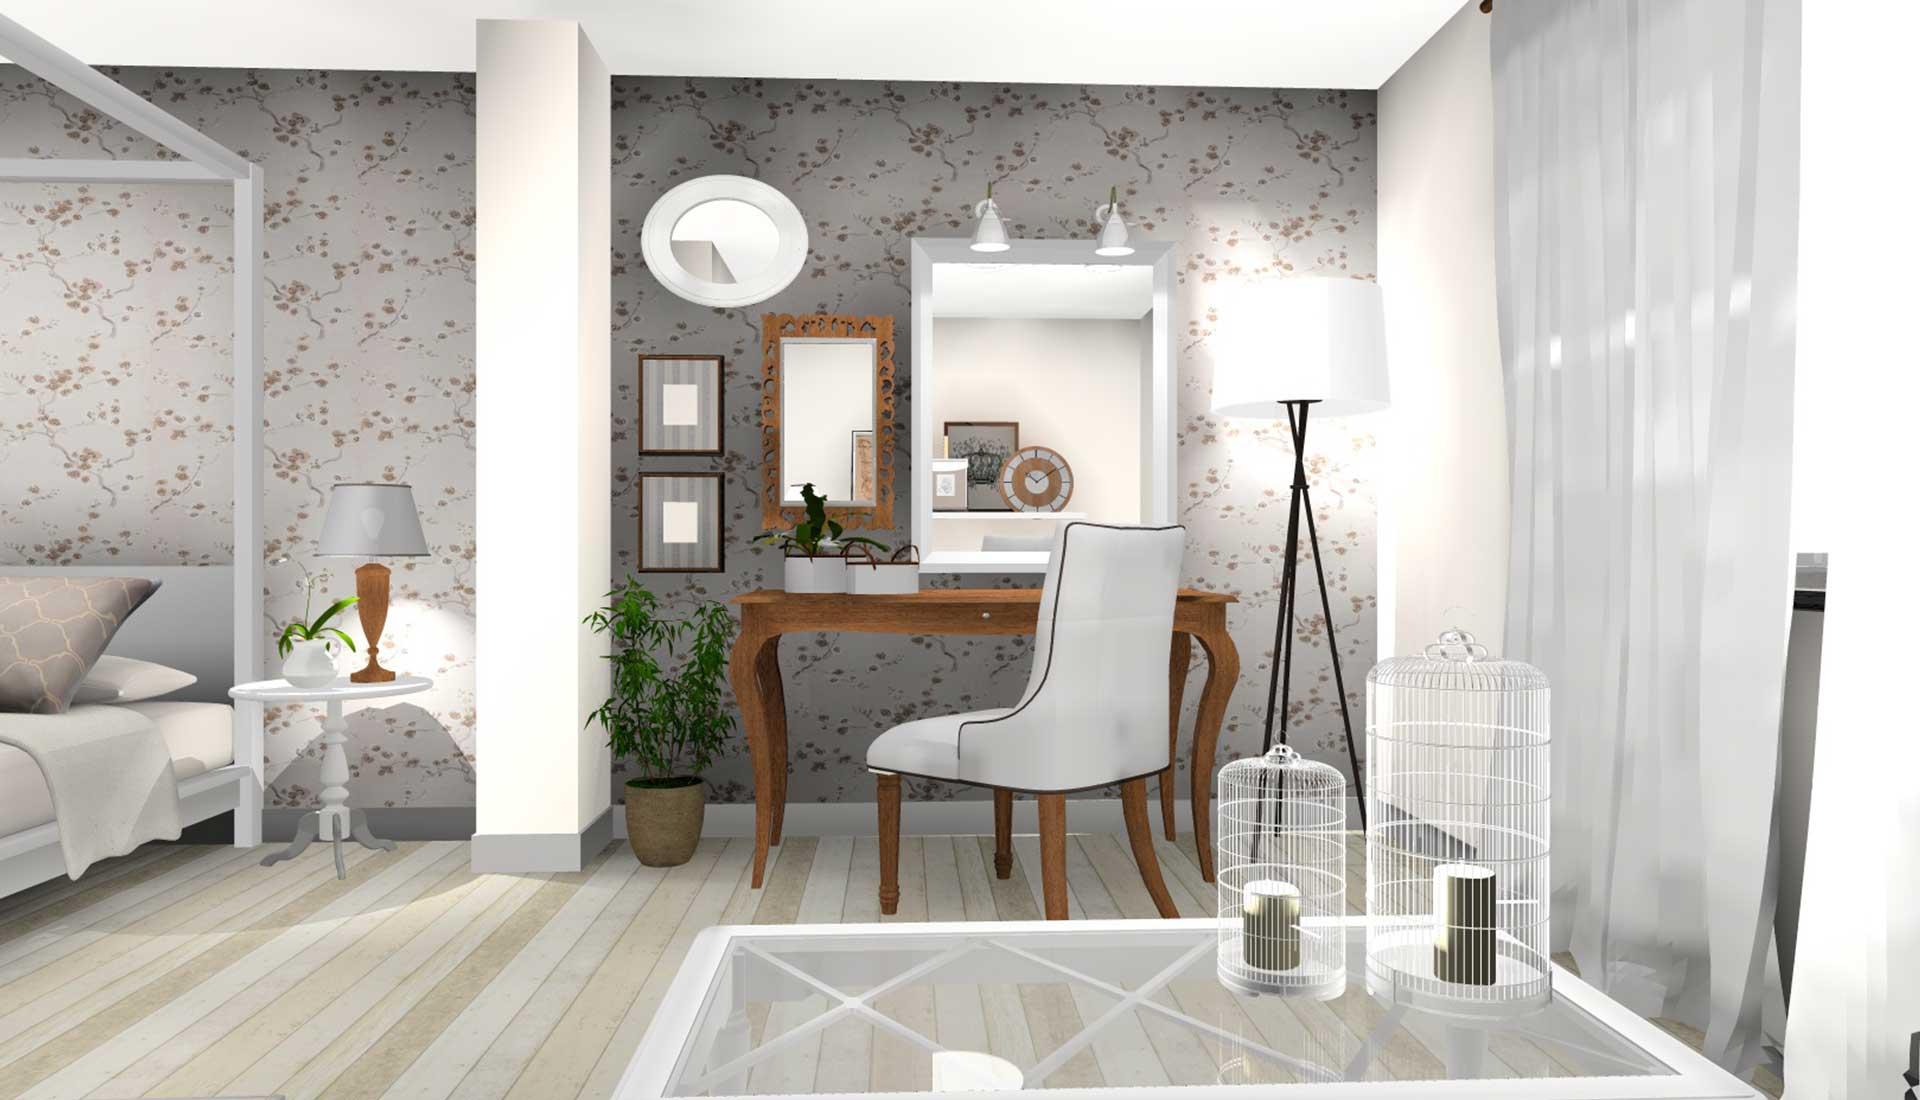 decoracion de interiores san rafael suit matrimonio escritorio